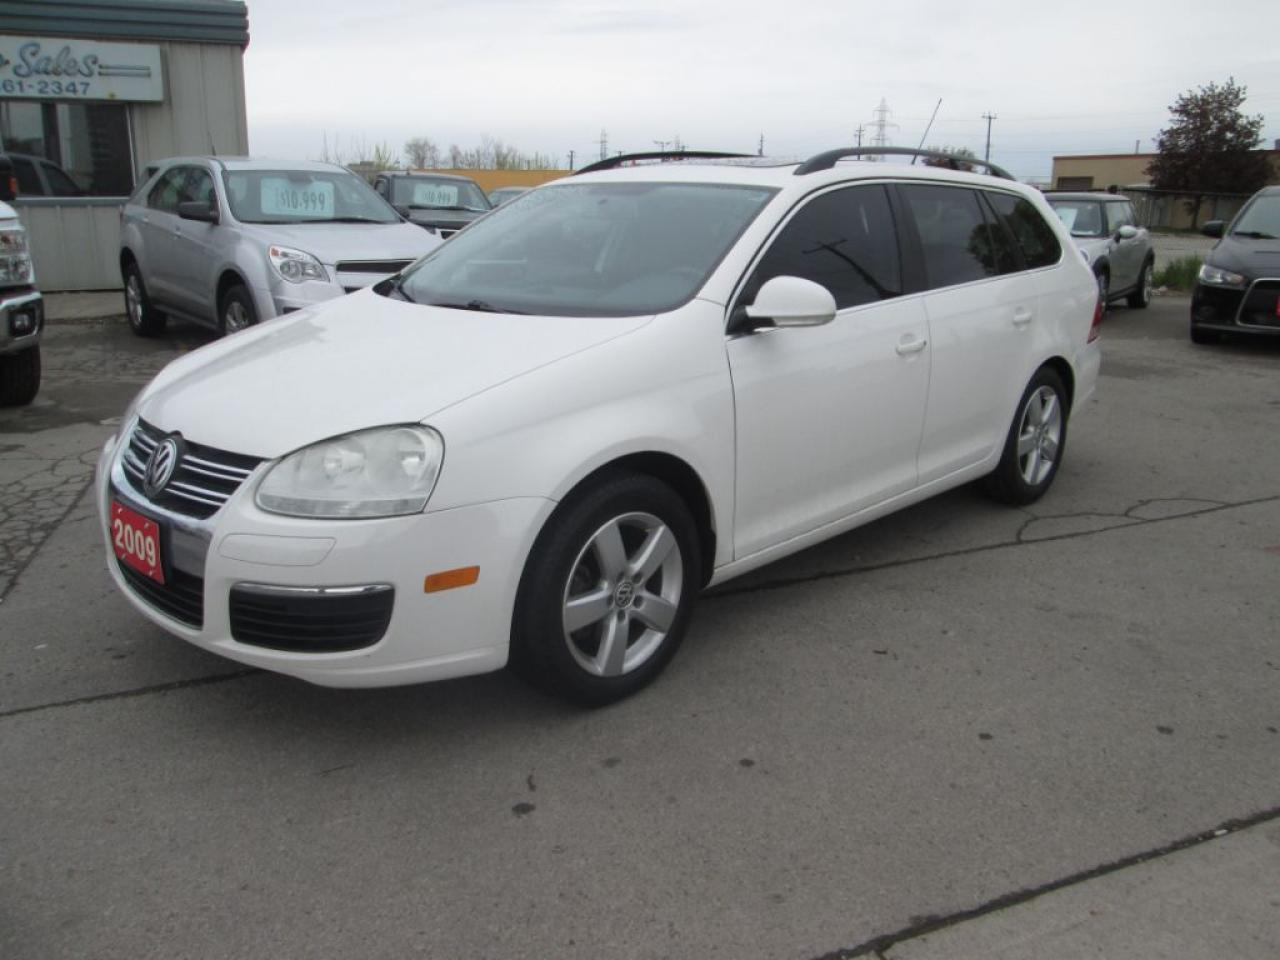 Photo of White 2009 Volkswagen Jetta Wagon